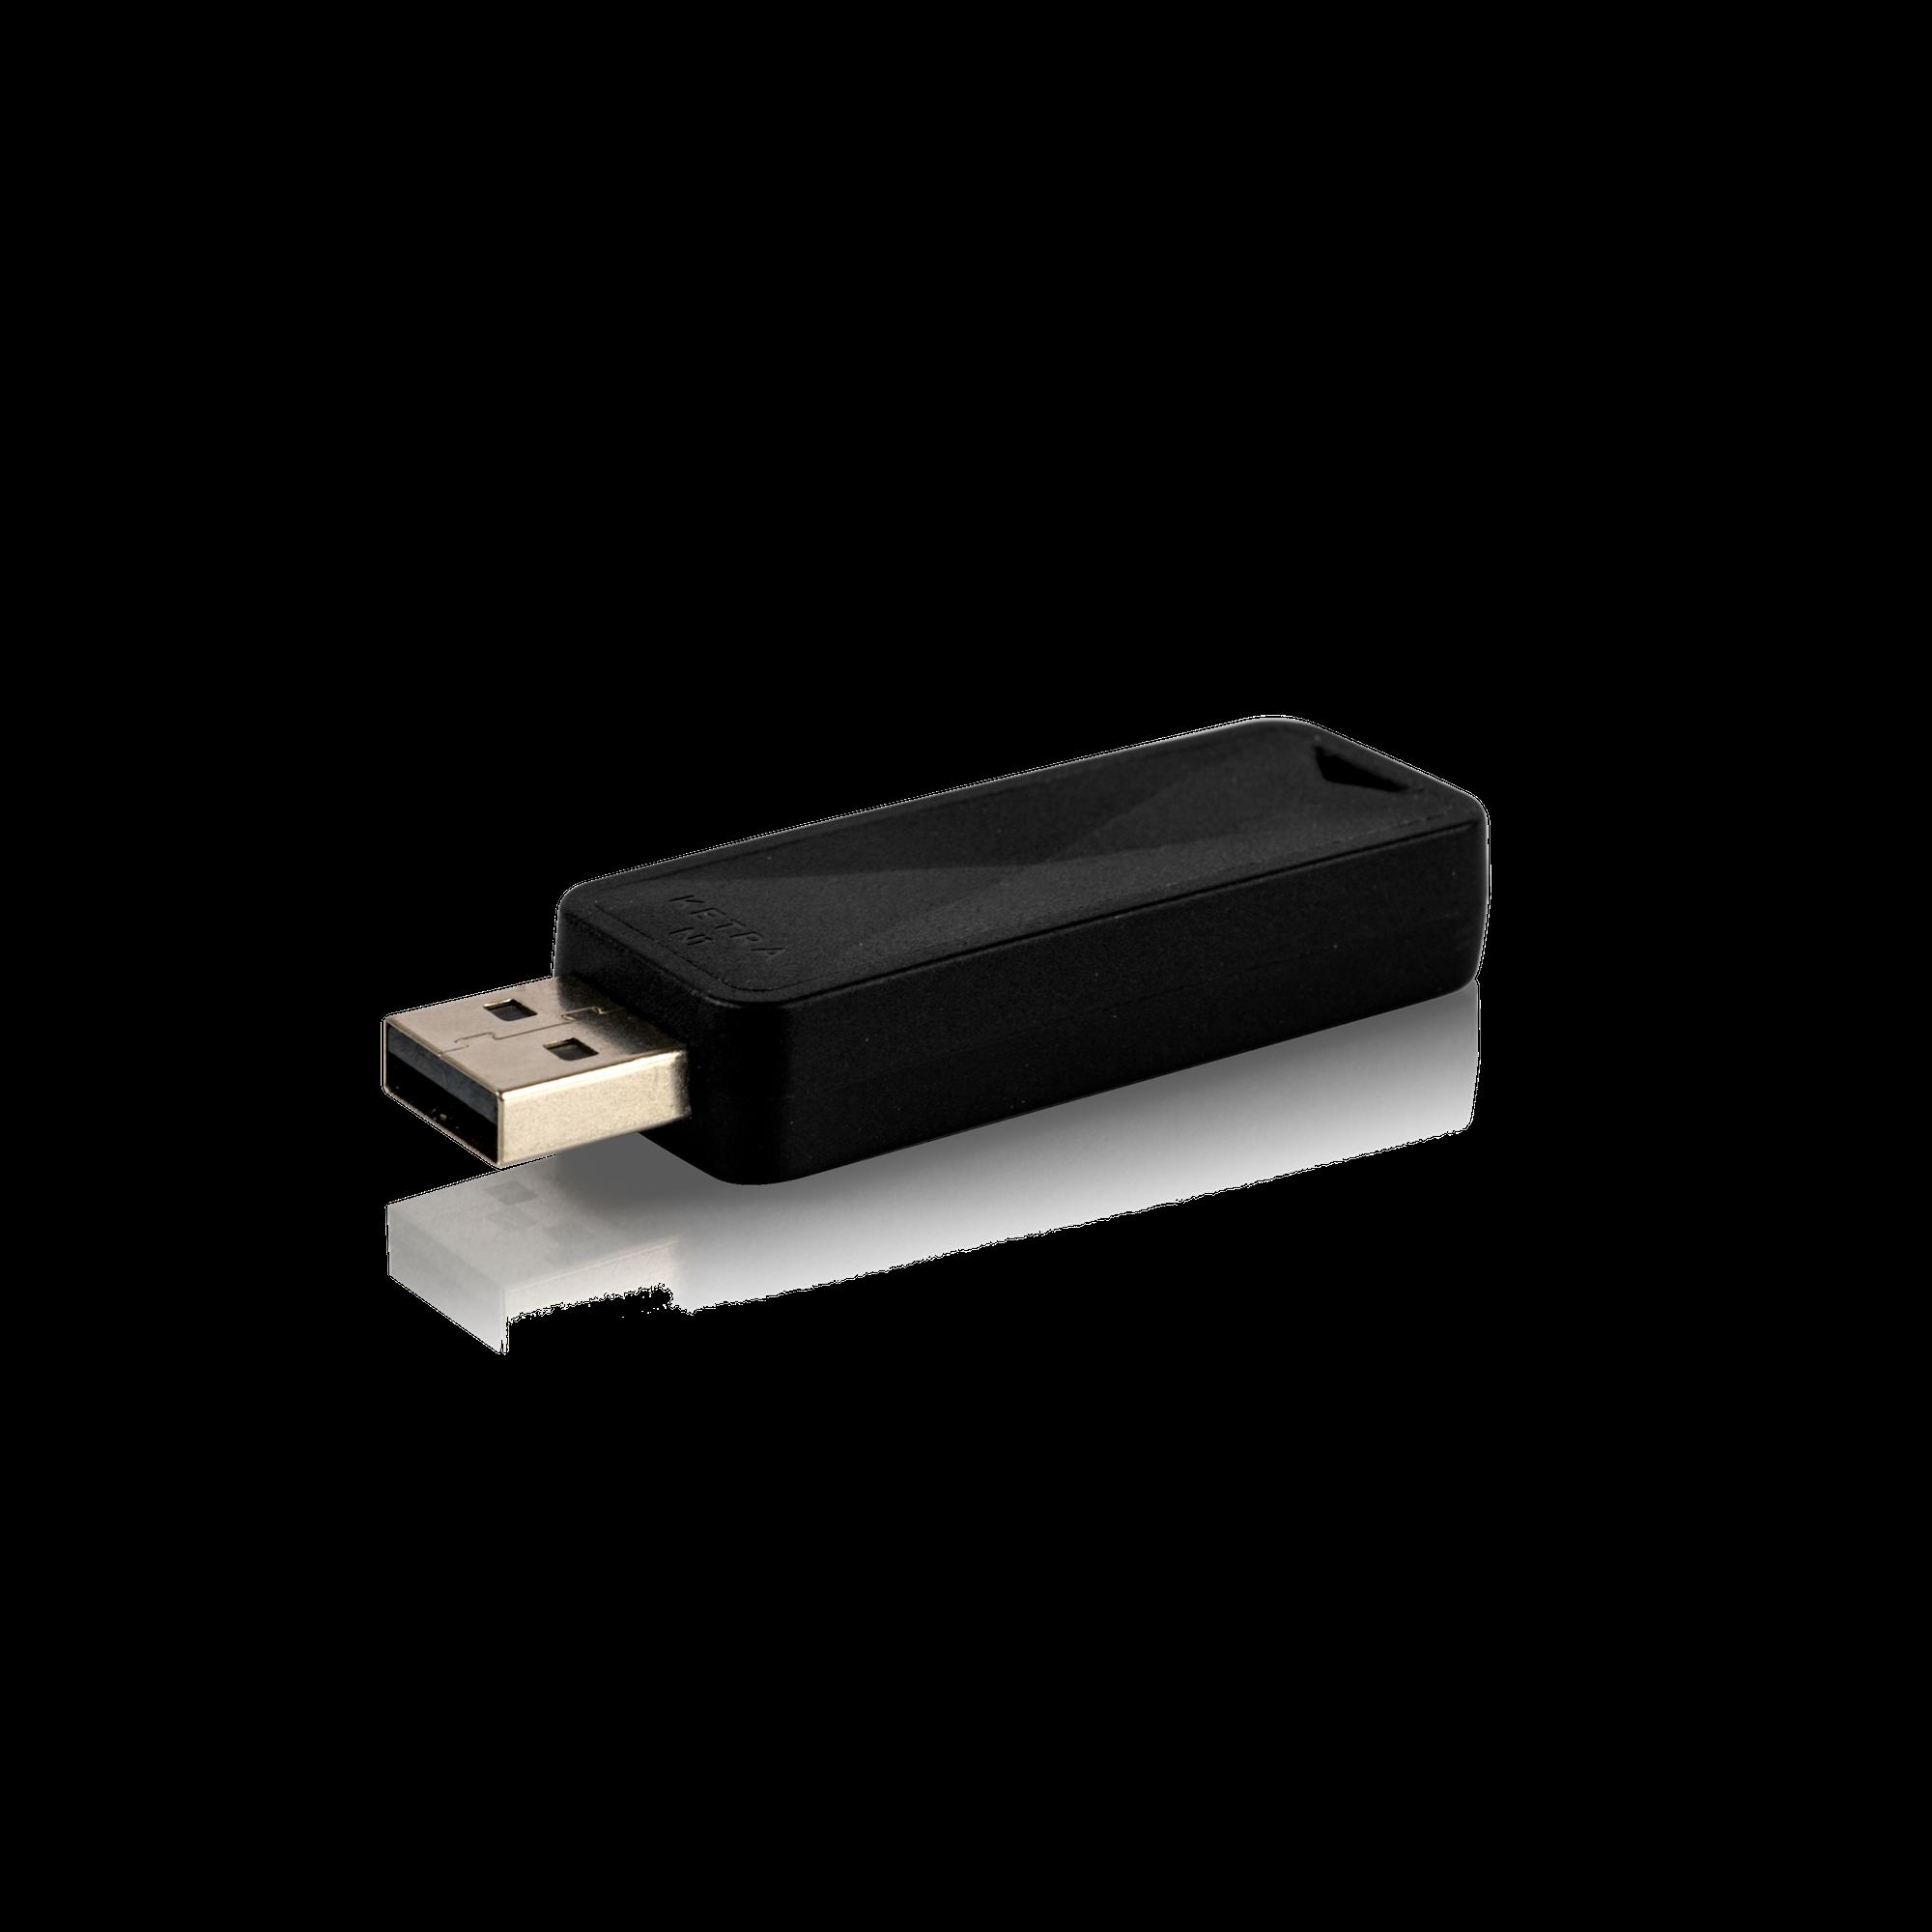 2 N1 USB Repeaters